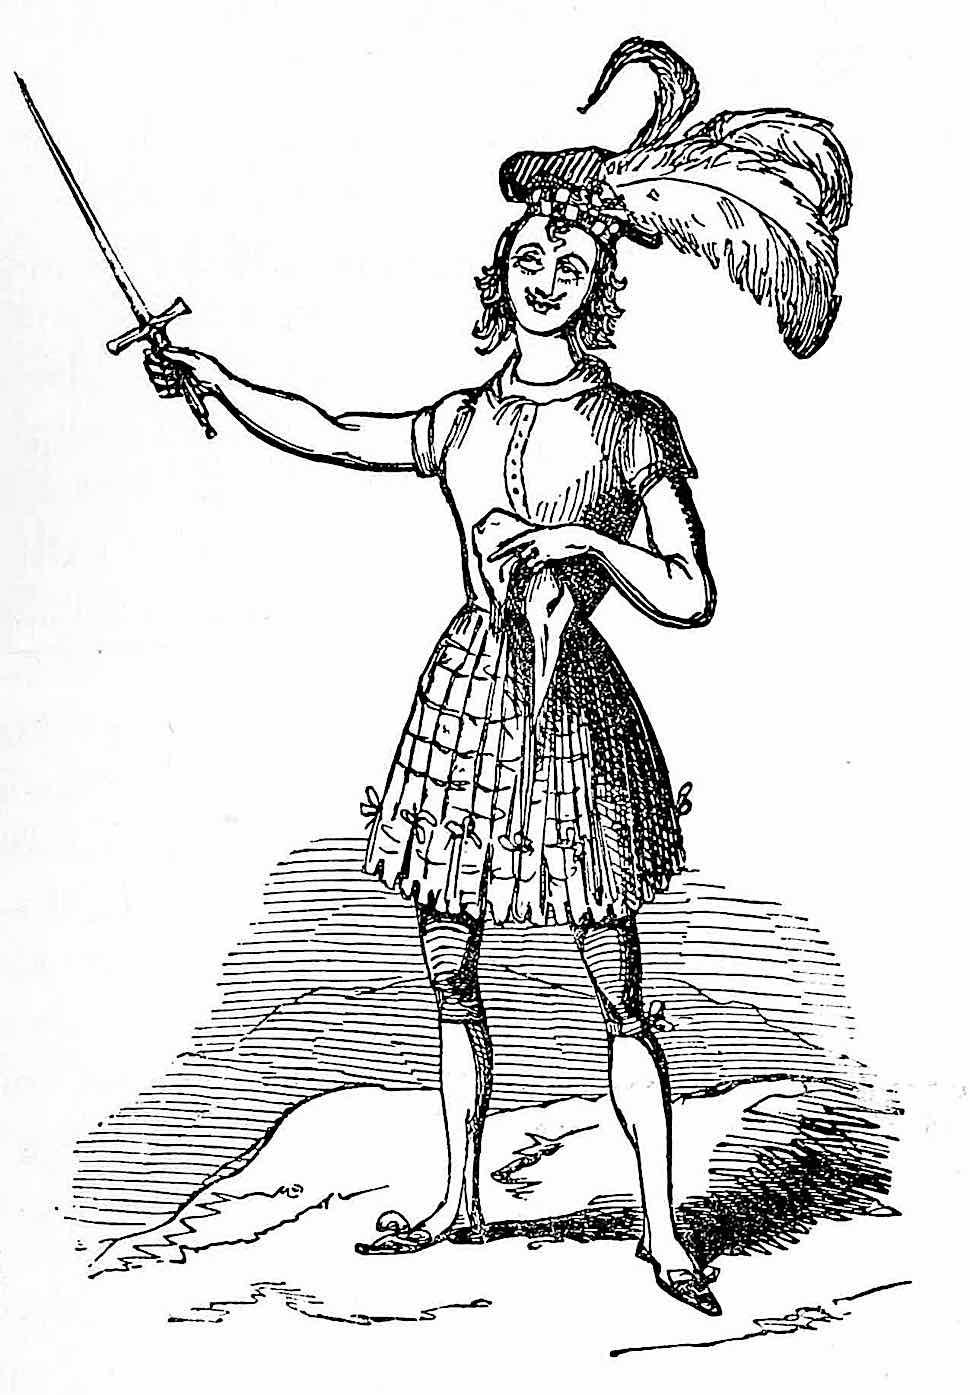 a William Makepeace Thackeray cartoon of a sissy Scotsman